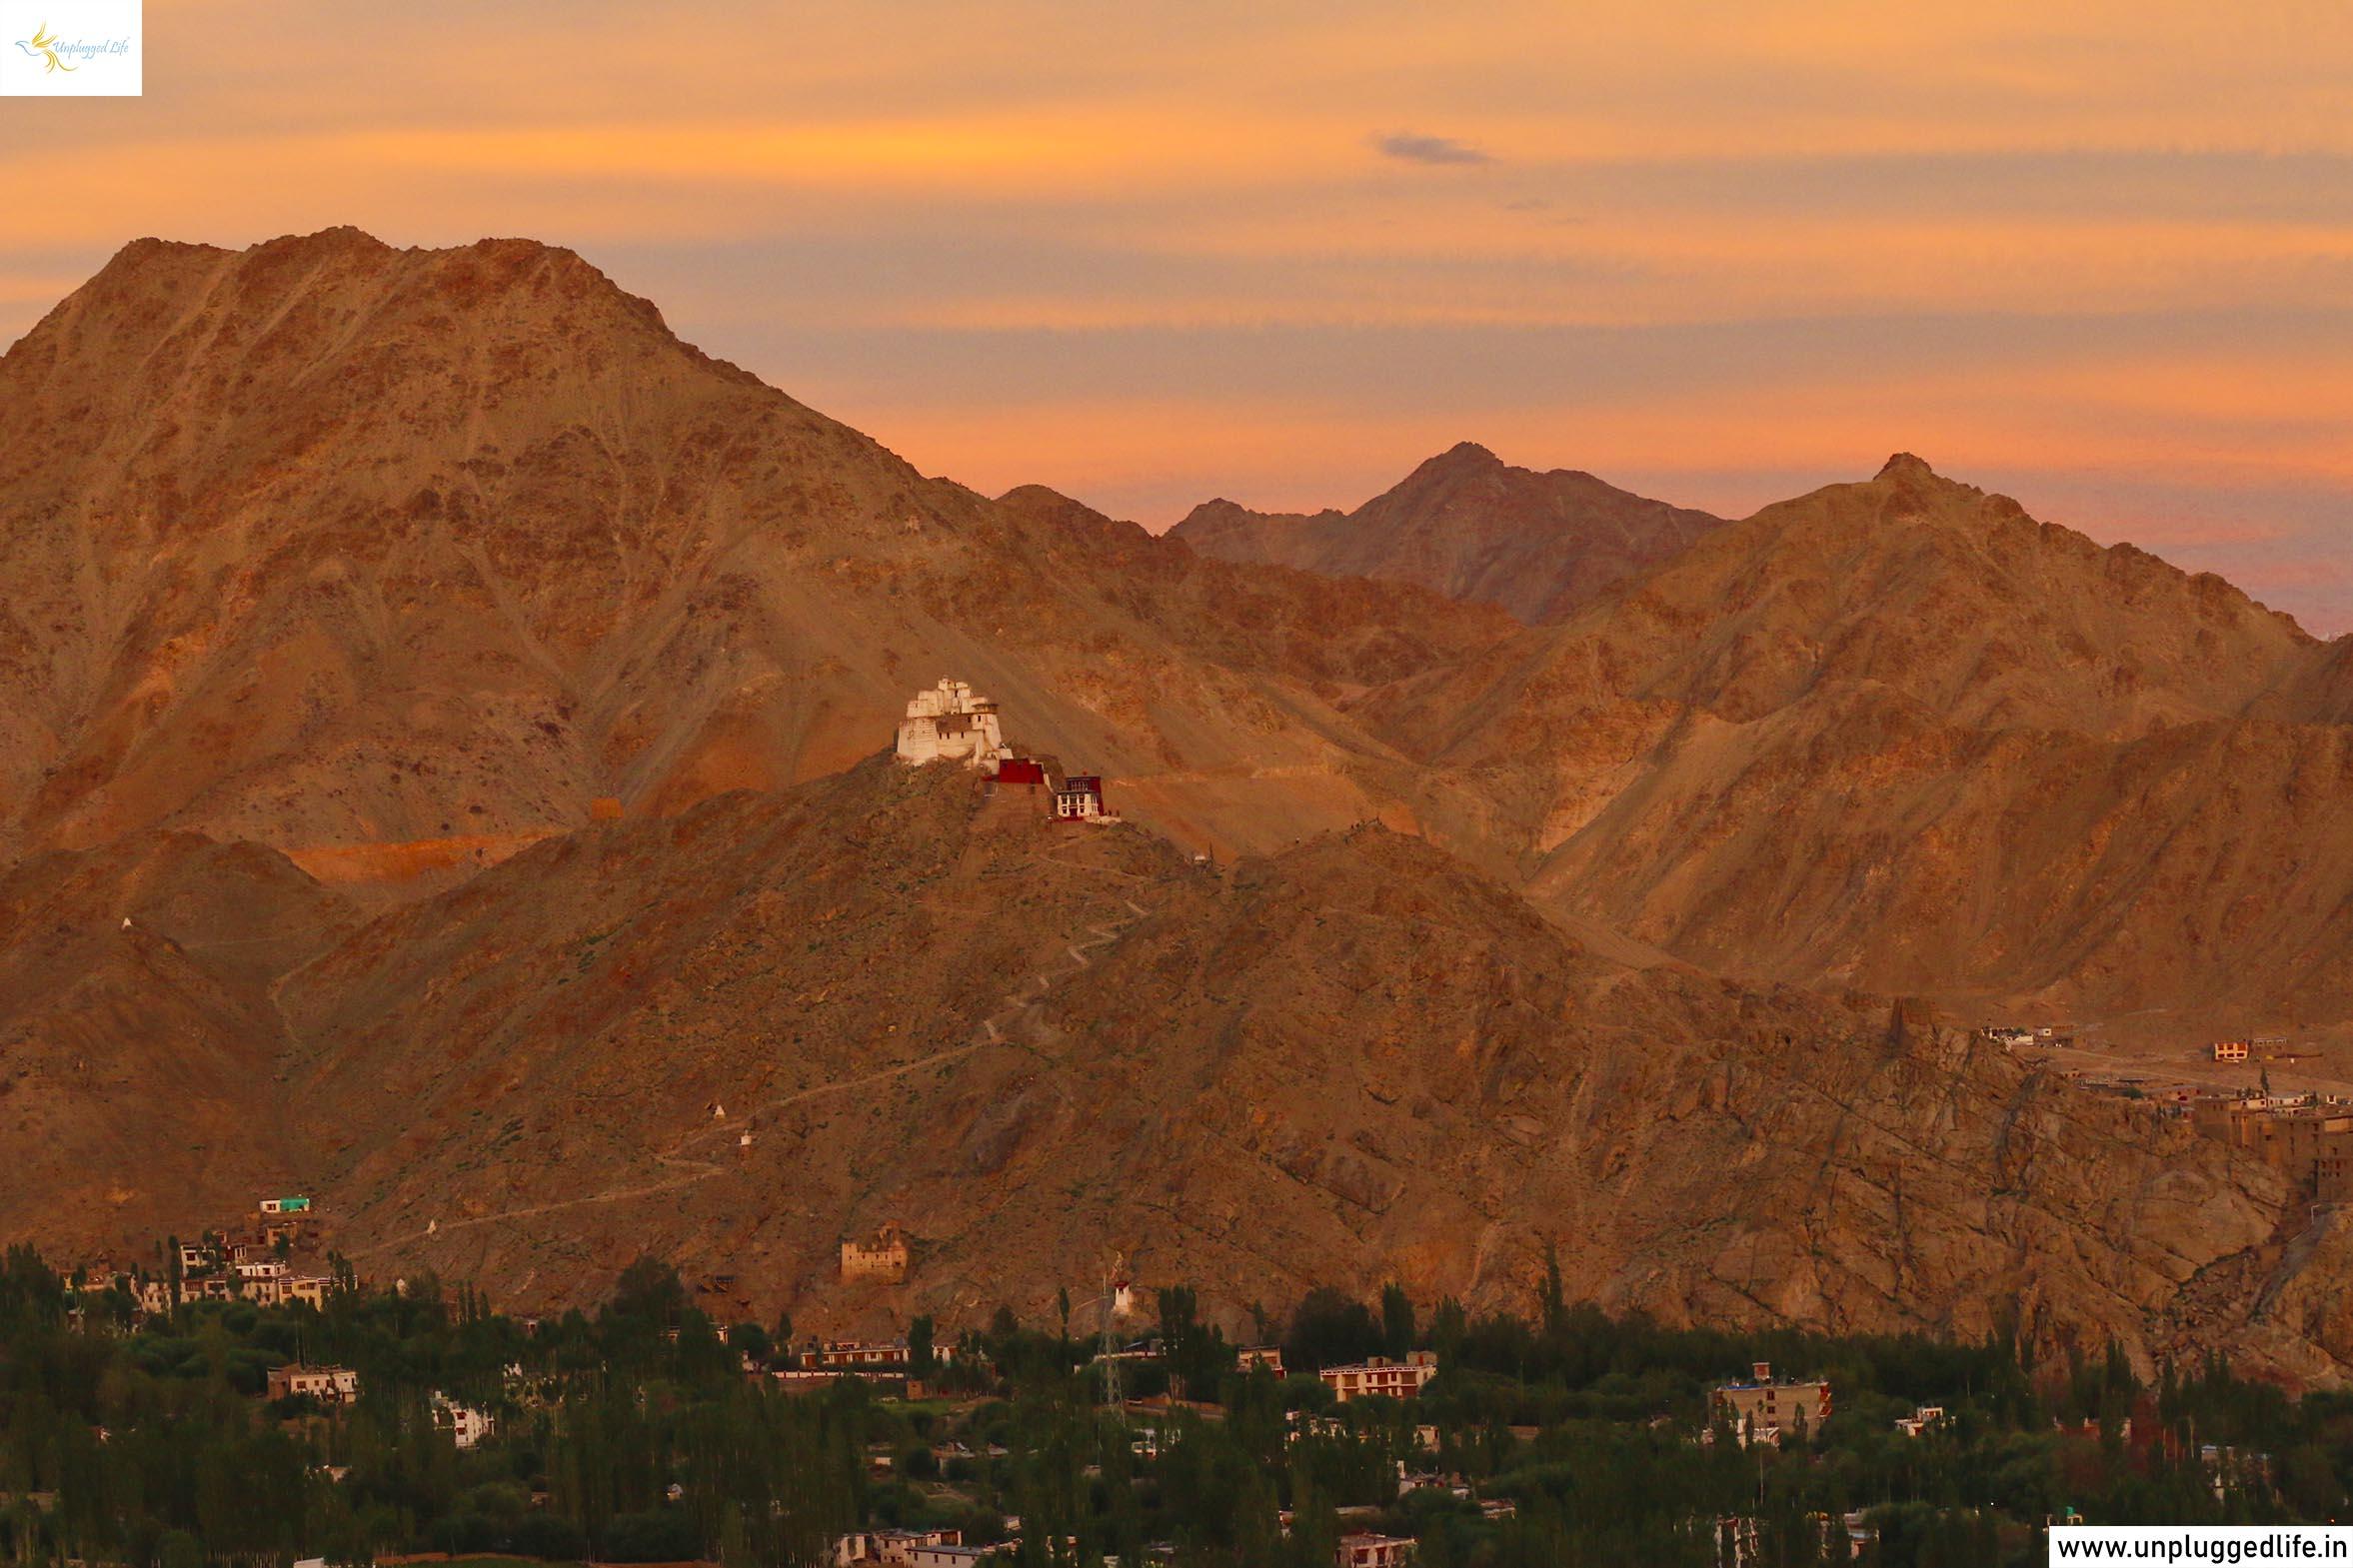 Unplugged Life, Himalayas, Ladakh, Leh View, View of Ladakh, View from Shanti Stupa, Shanti Stupa Sunset View, Sunset in Leh, Sunset in Ladakh, Namgyal Tsemo in Leh, Mountain View, Leh Ladakh Sightseeing Tour, Leh Ladakh Package, Book Ladakh Trip, Sunset Point, Best Sunsets